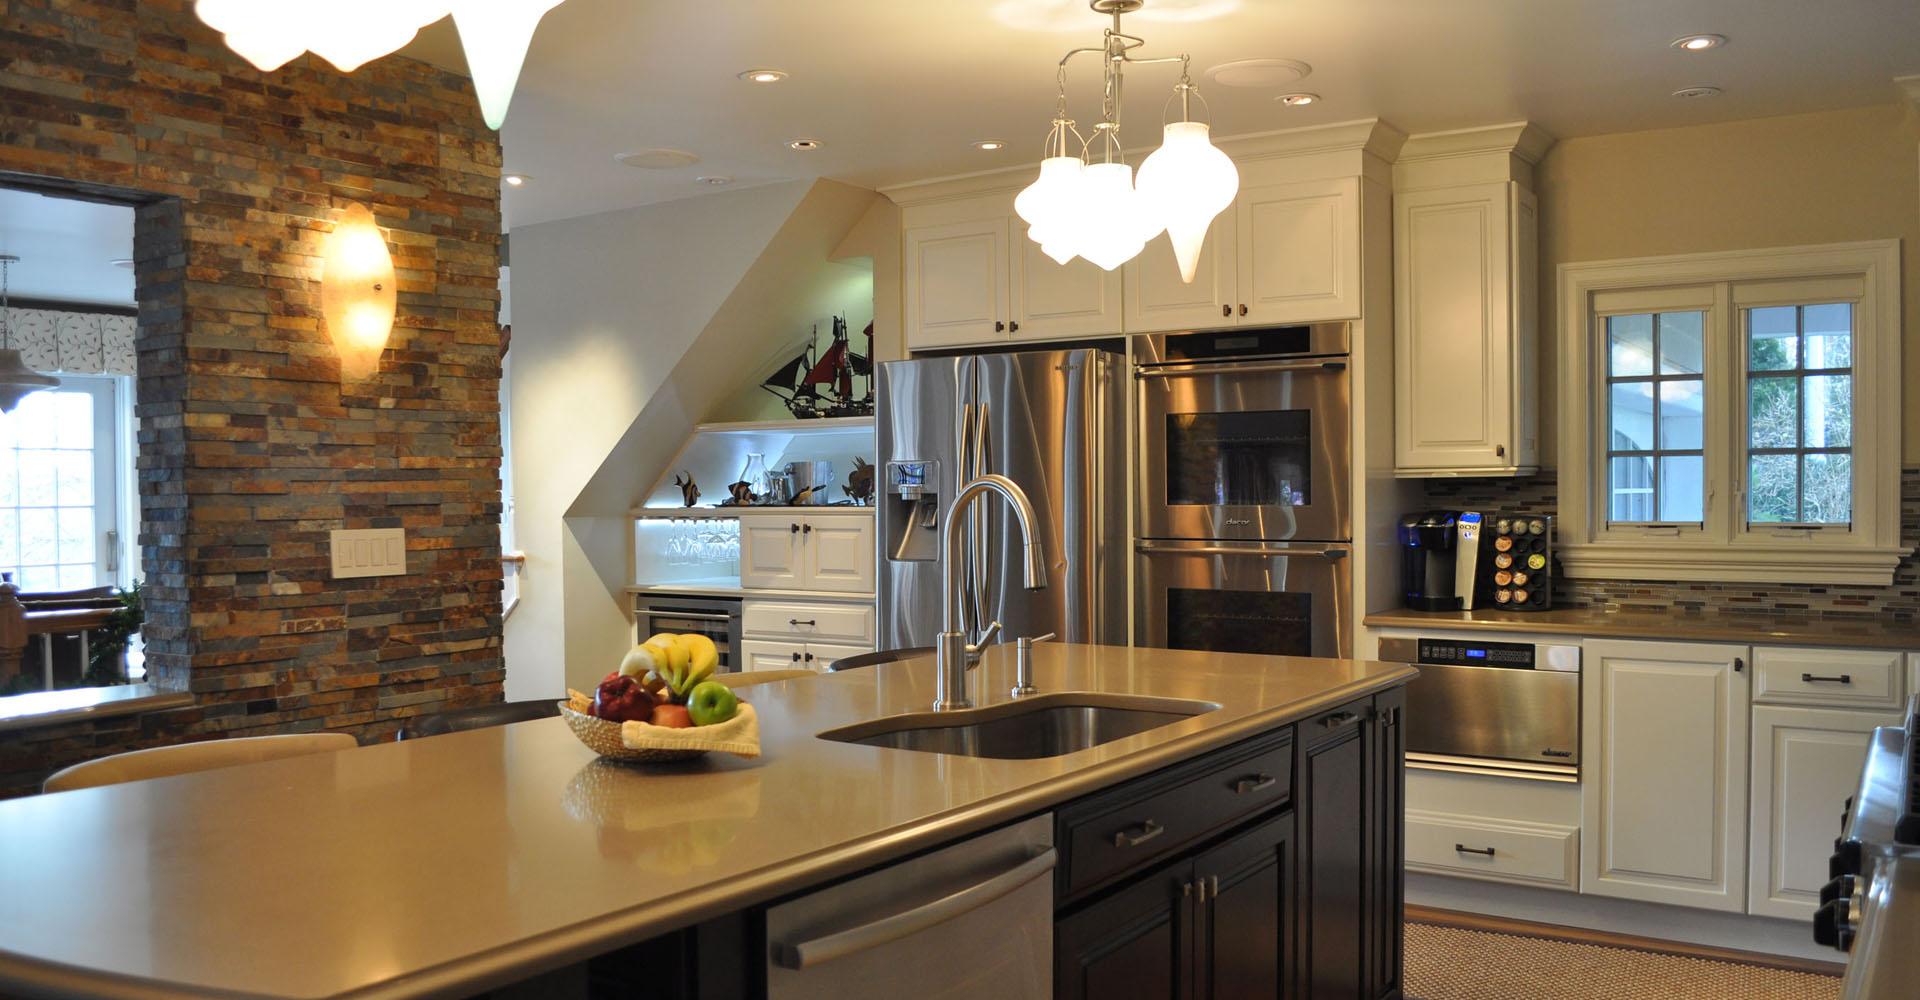 Kitchen-Remodel-island-Bronxville-New-York-1920